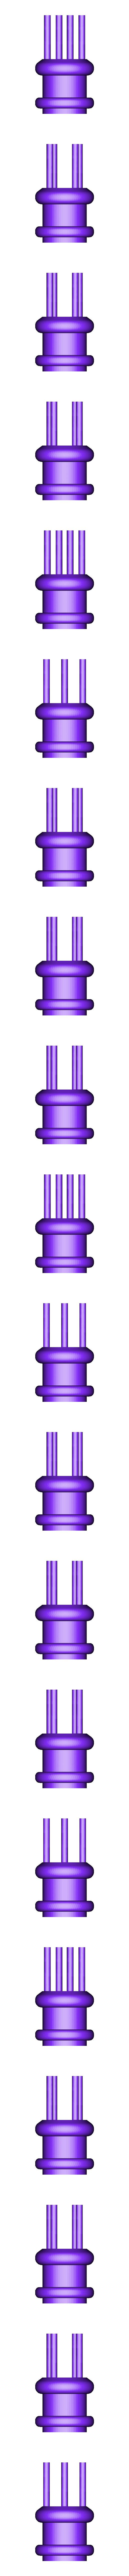 Thumper_body_4.stl Download free STL file Dune Thumper - working • 3D printing design, poblocki1982